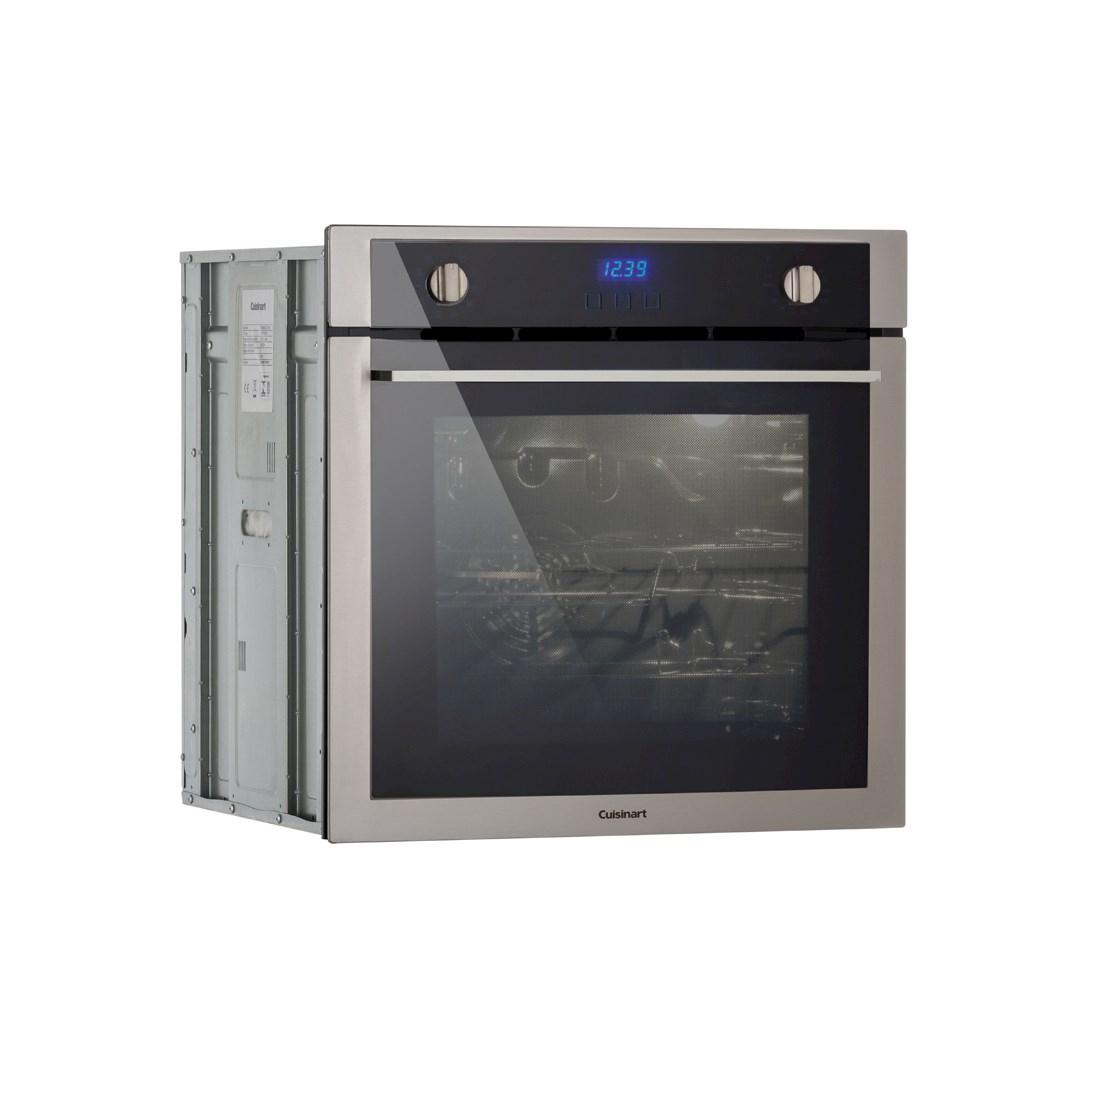 Forno Elétrico Multifunções Cuisinart Casual  83 Litros Inox 60cm 220V